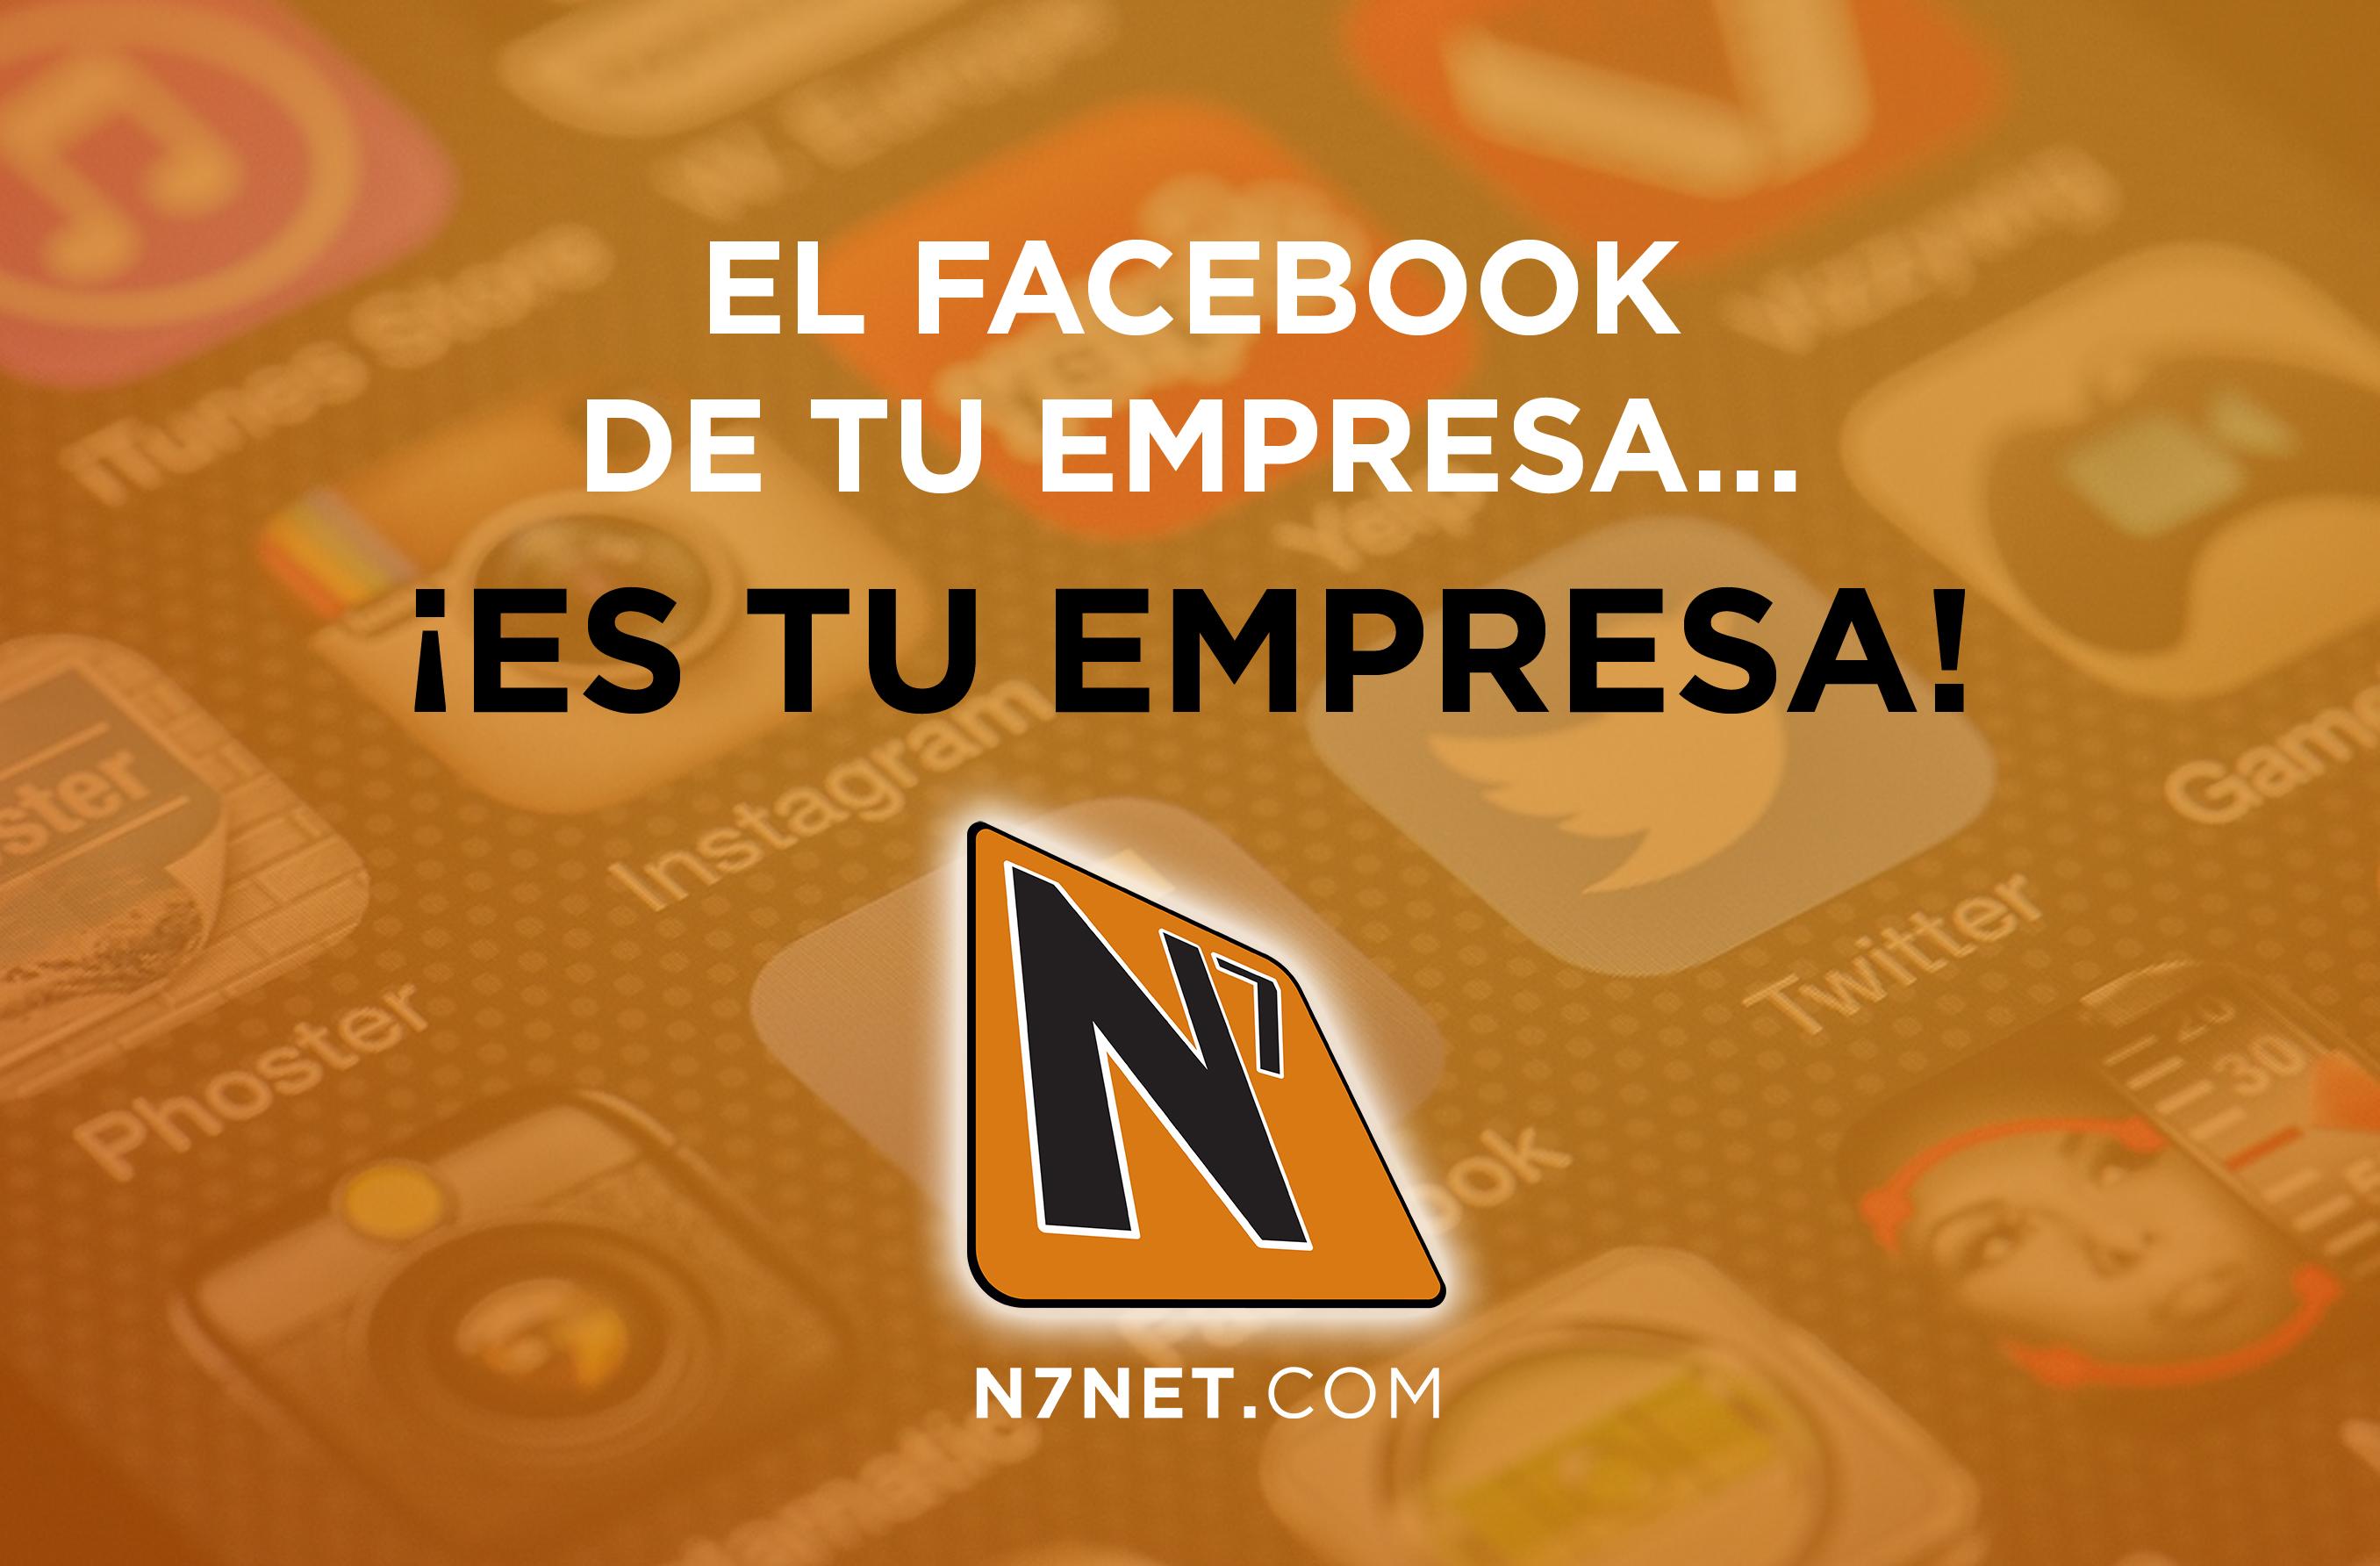 El Facebook de tu empresa… ¡es tu empresa!